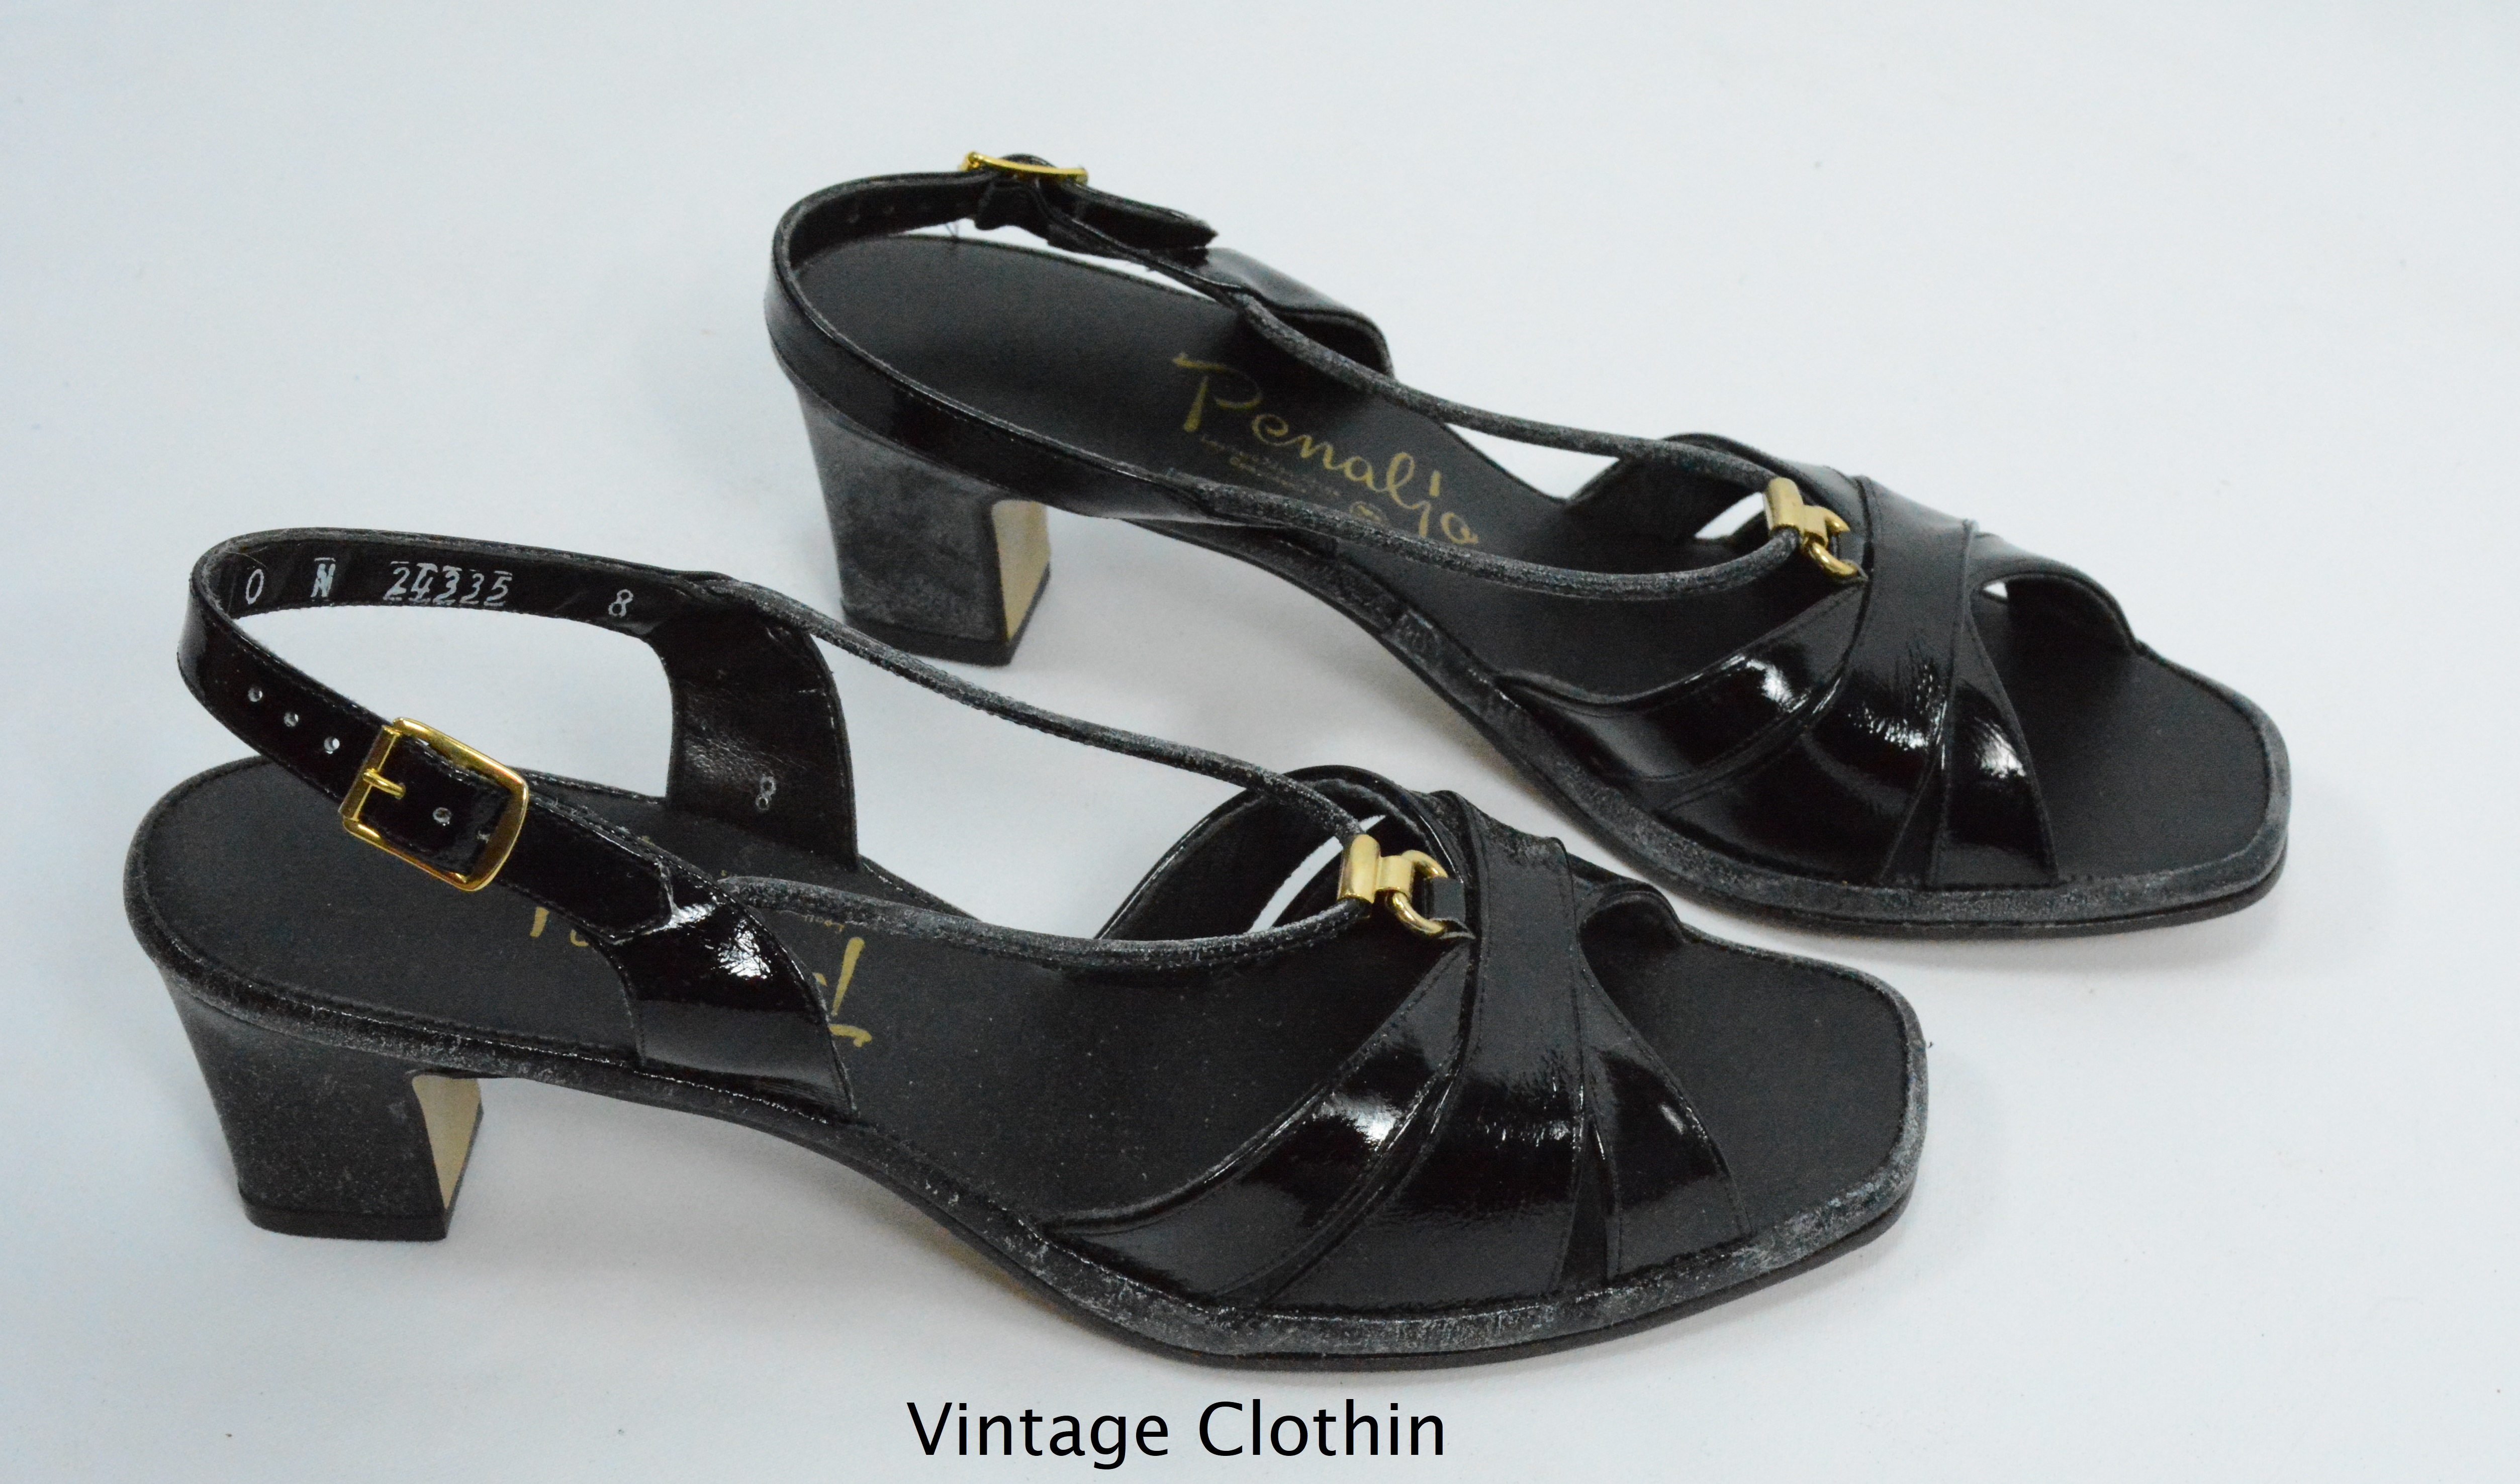 0230689ddb120 1980's Penaljo Black Patent Peep Toe Sandals For Sale – Women's ...